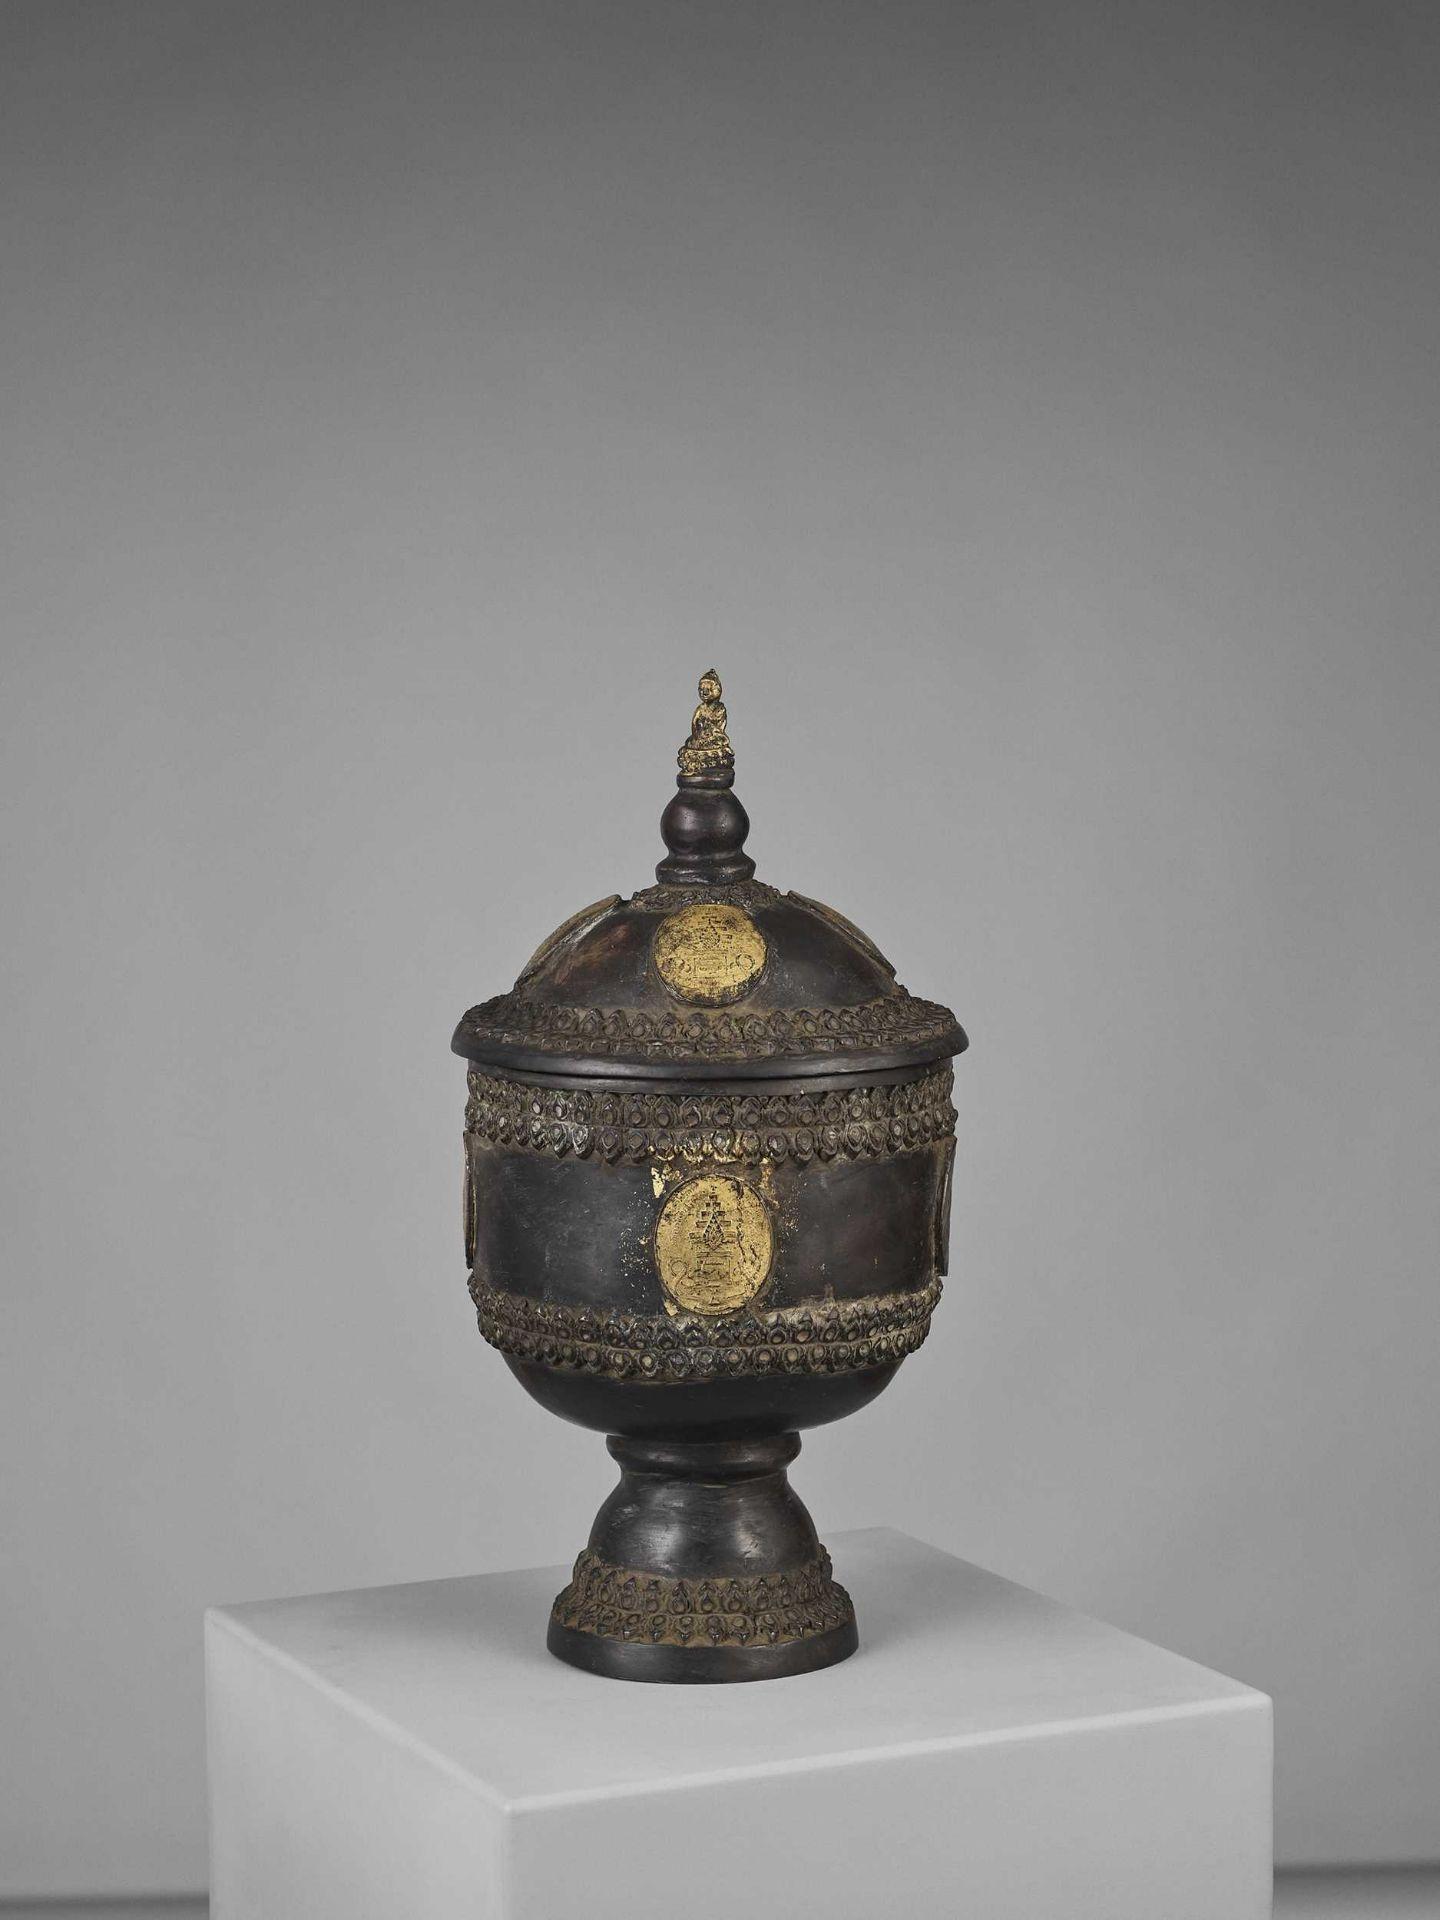 A CHAM PARCEL-GILT BRONZE VESSEL AND COVER WITH BUDDHA SHAKYAMUNI - Bild 9 aus 11